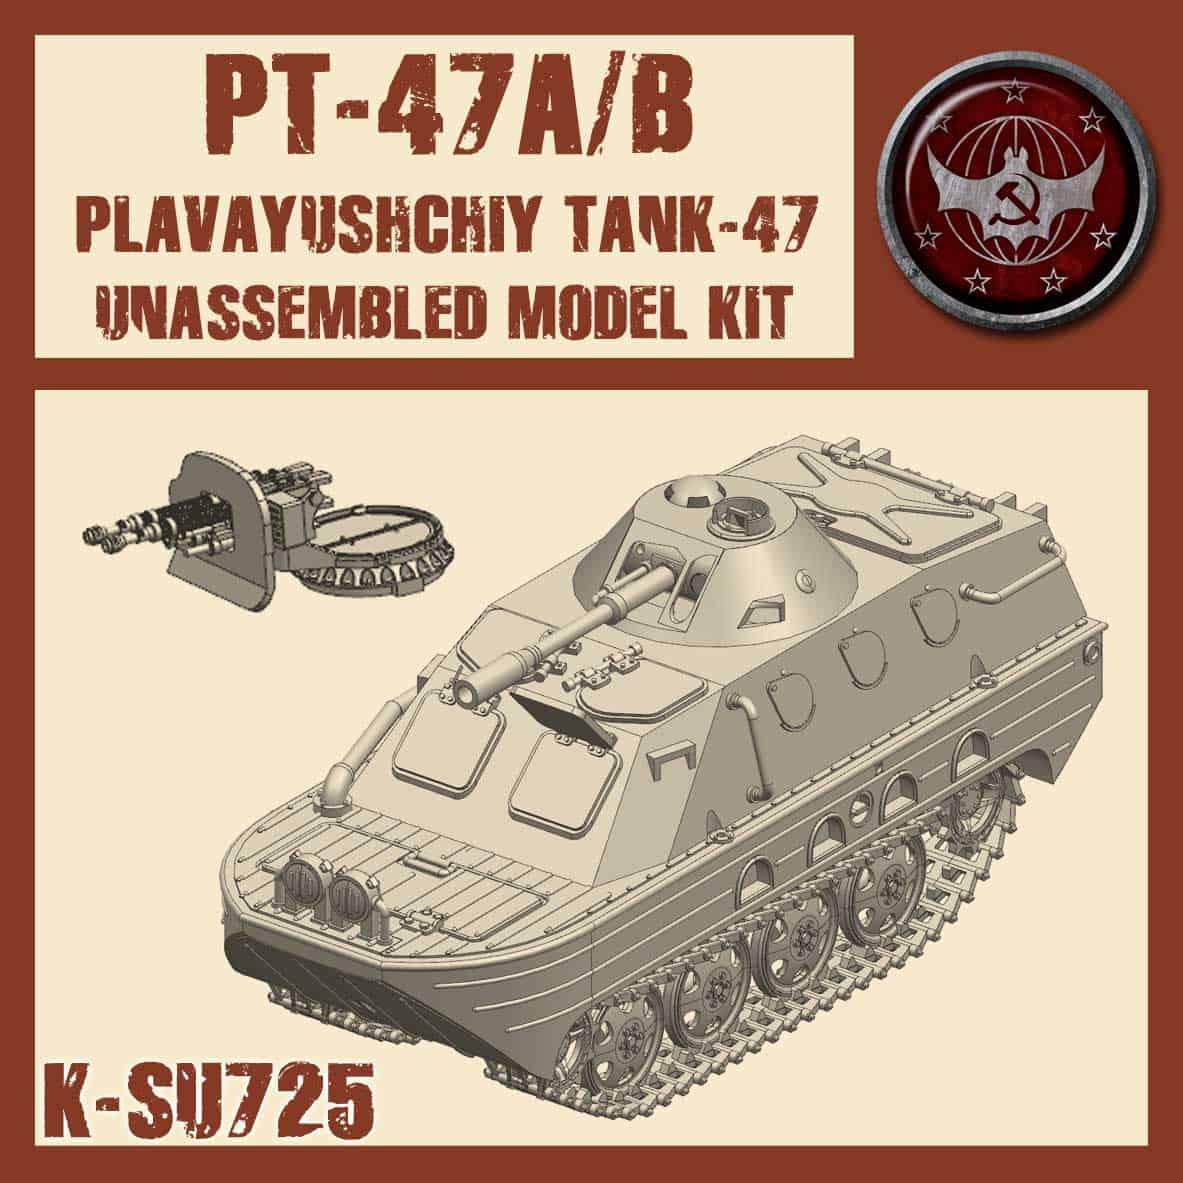 PT-47A/B – PLAVAYUSHCHIY TANK-47 Kit